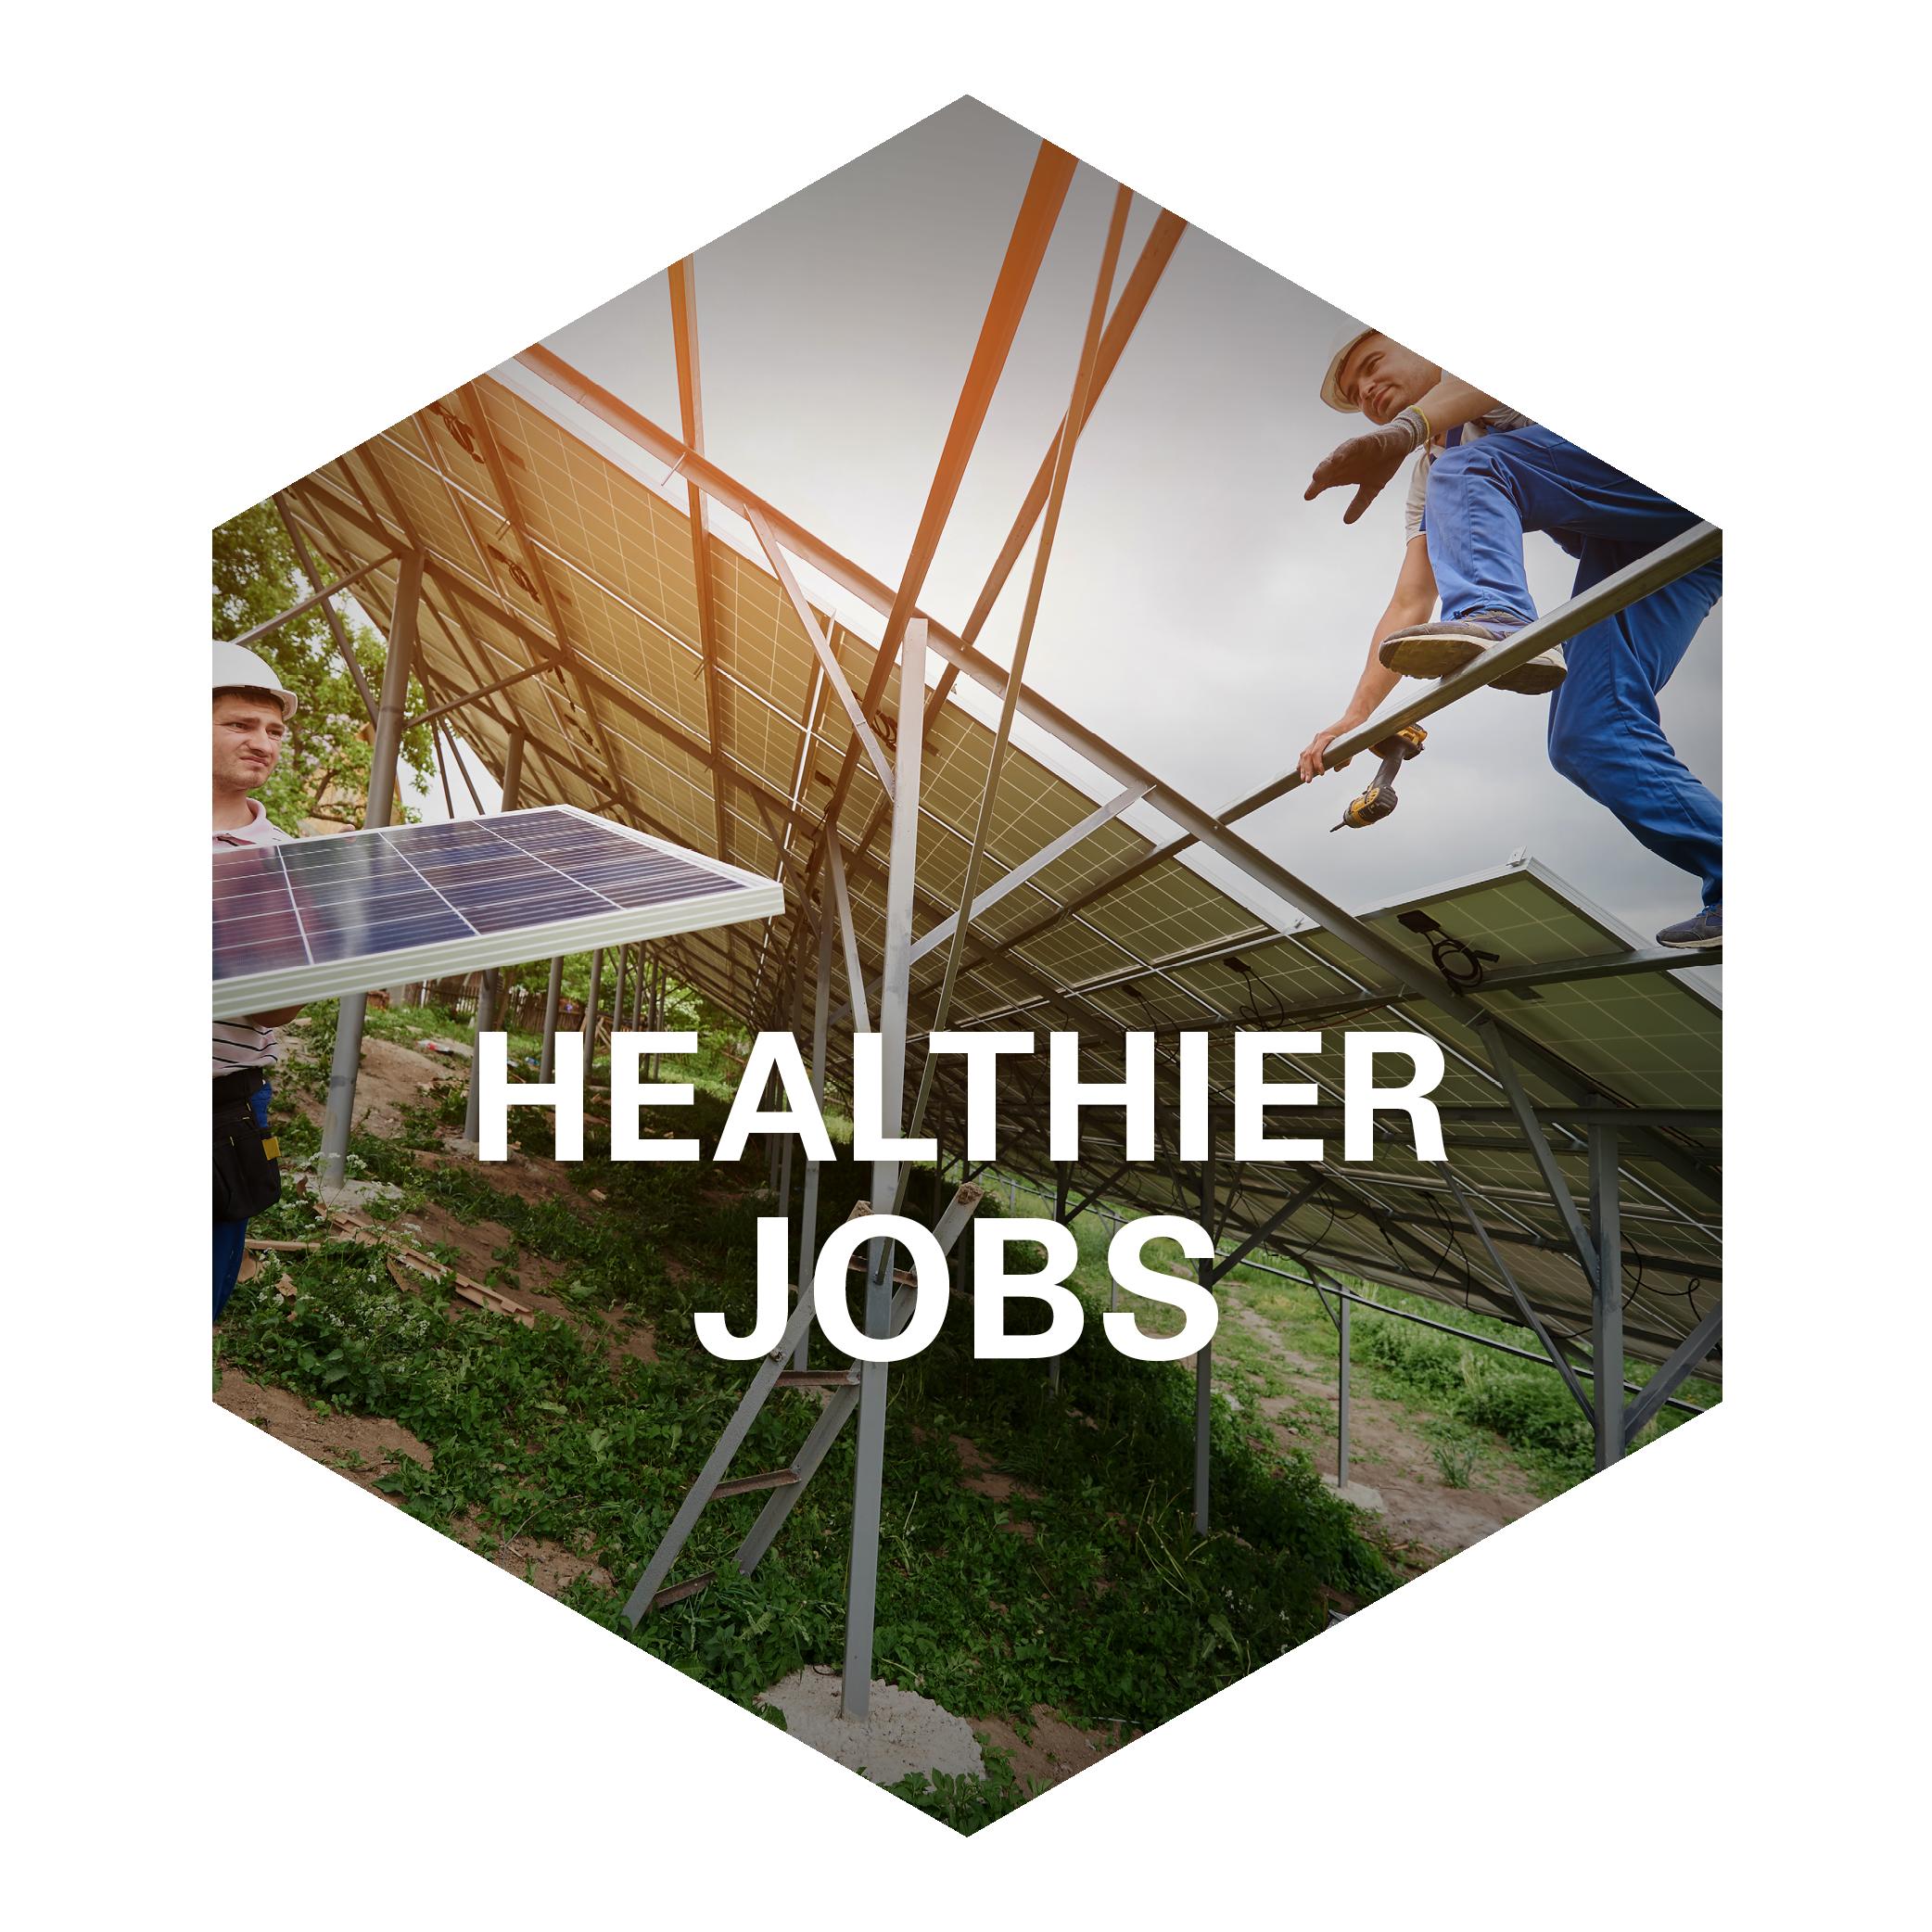 Healthier Jobs